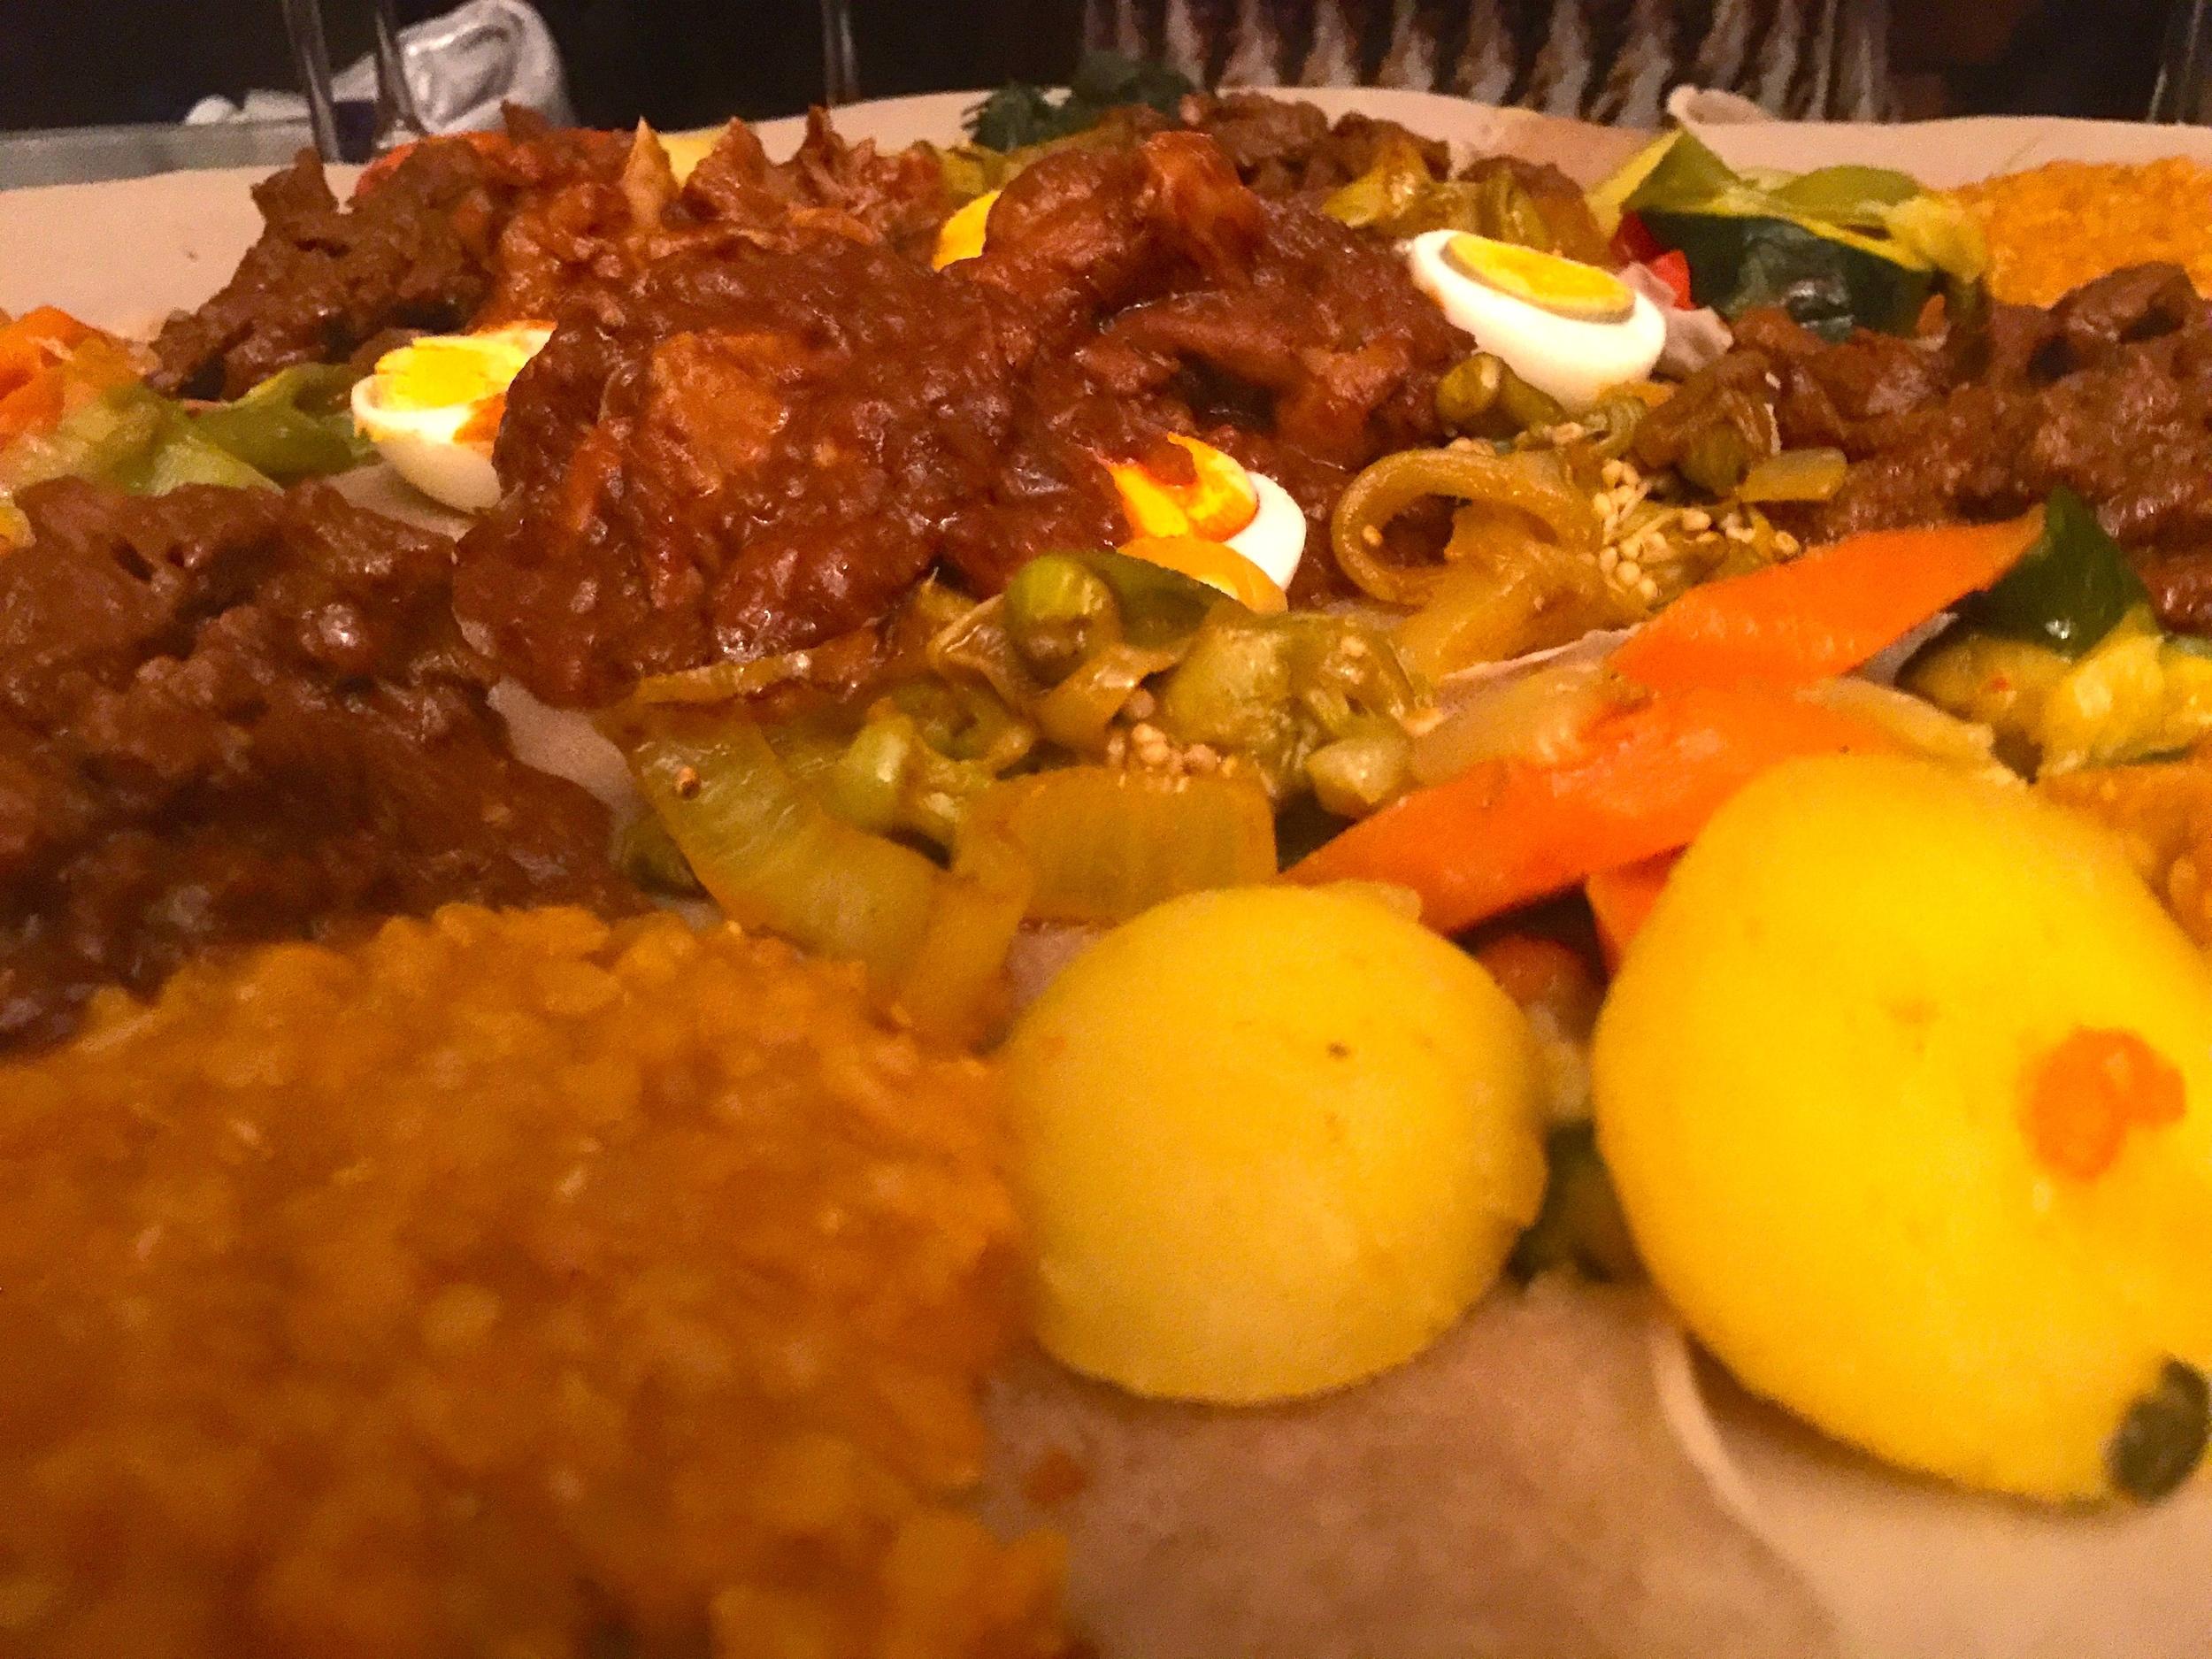 Kulwa meat platter served on injeera